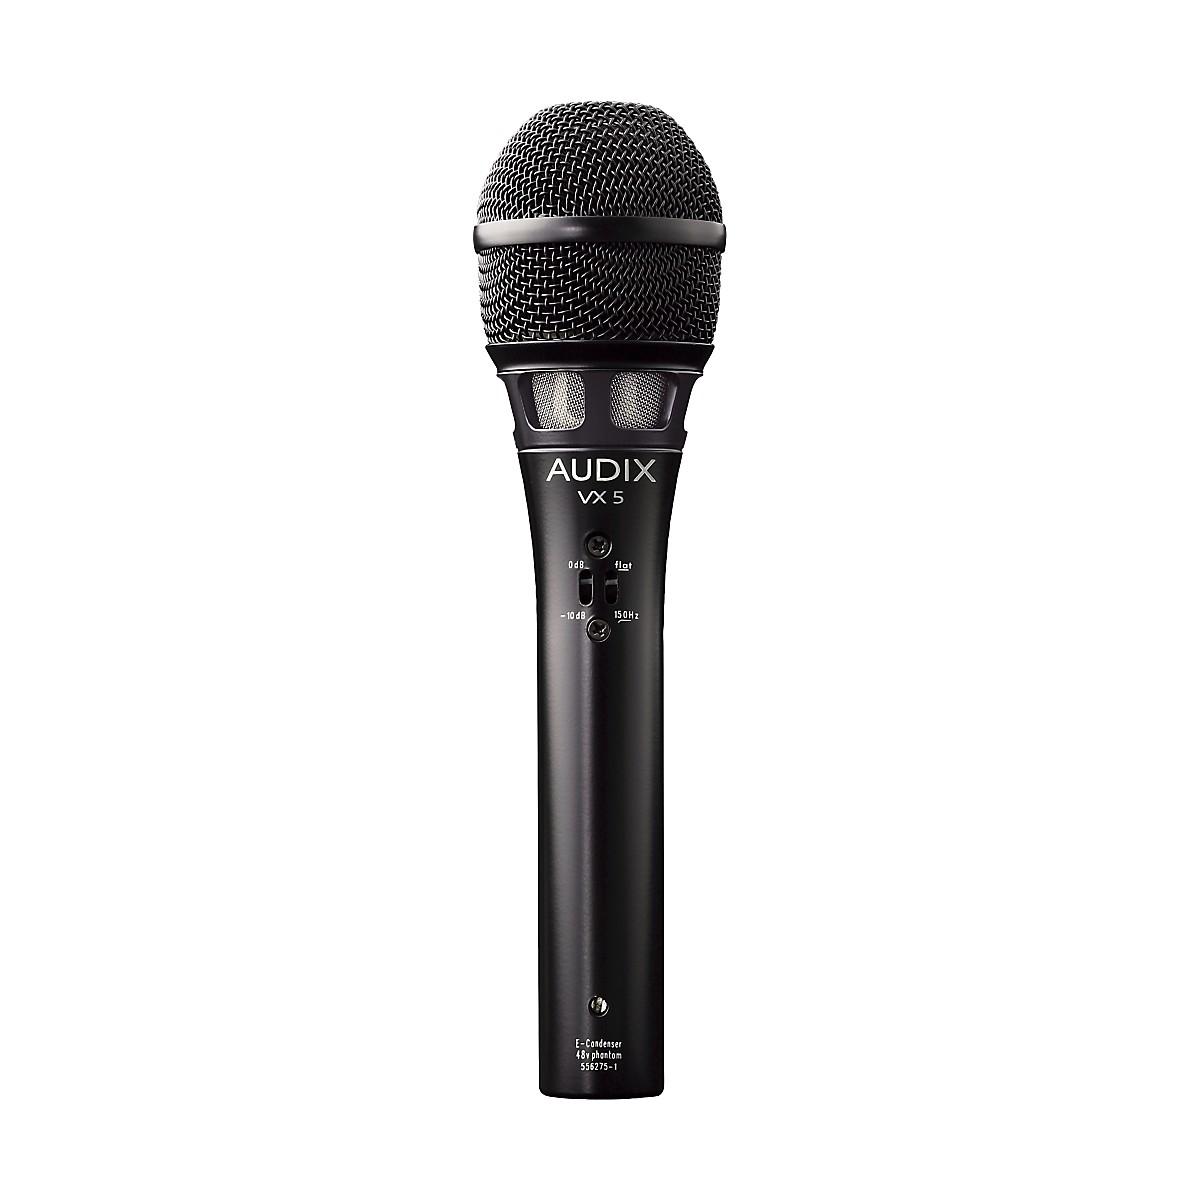 Audix VX5 Handheld Supercardioid Condenser Microphone